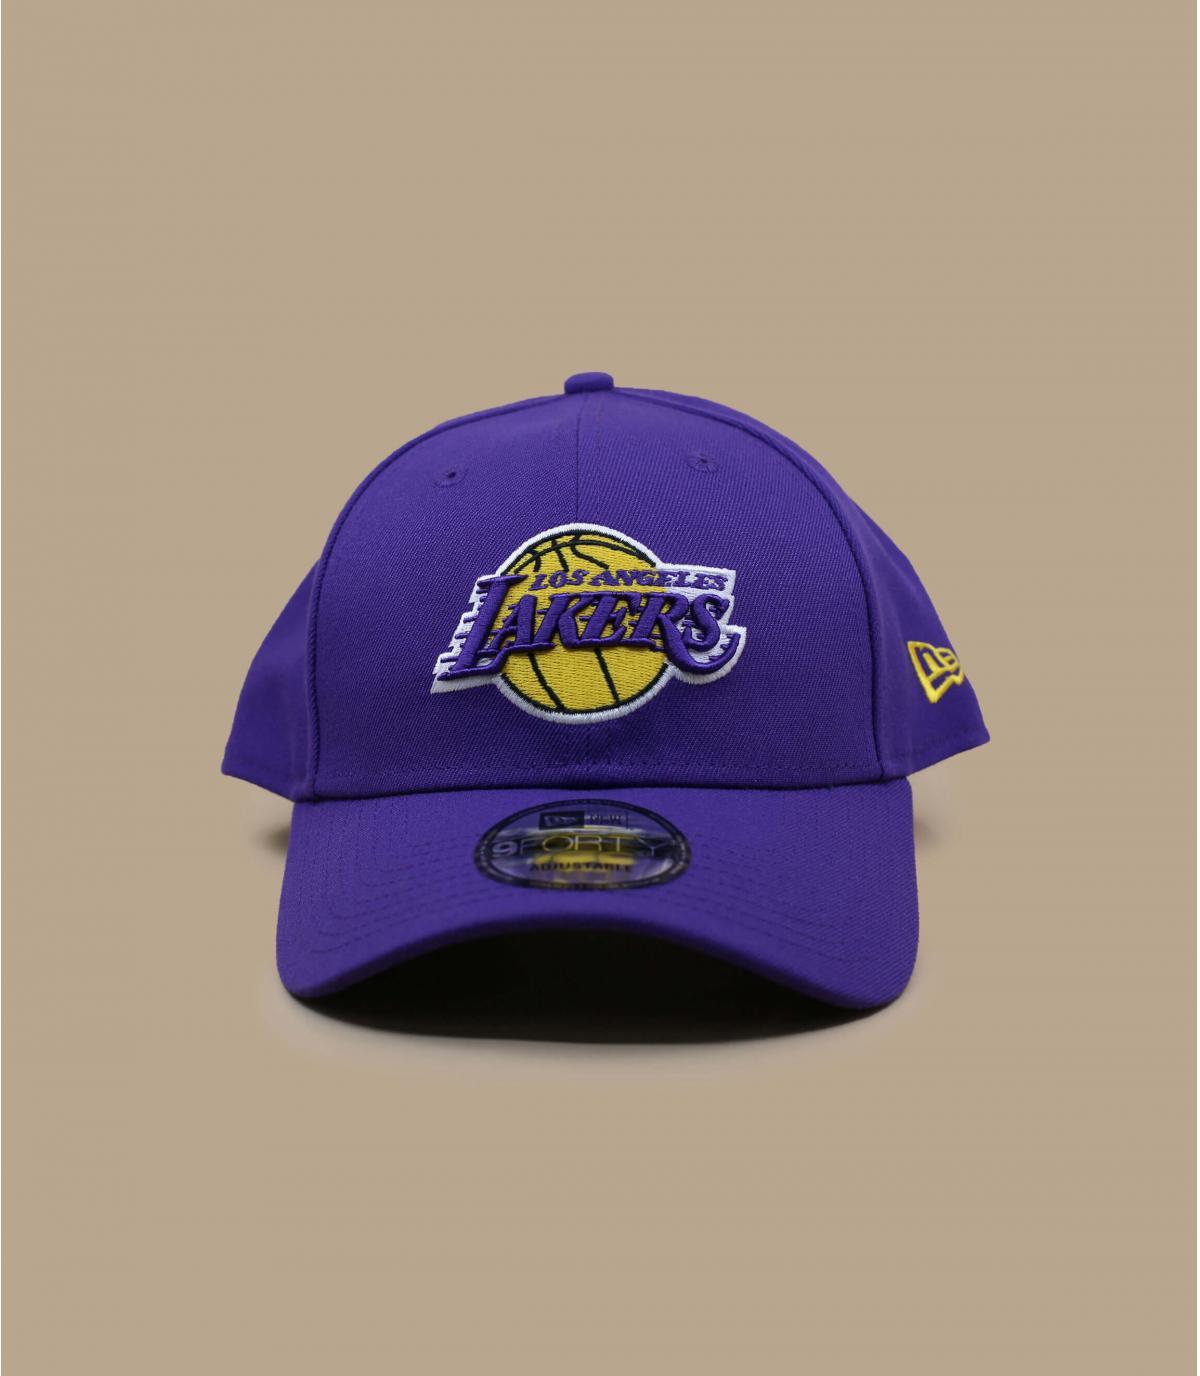 bef310cd6 NBA The League Lakers